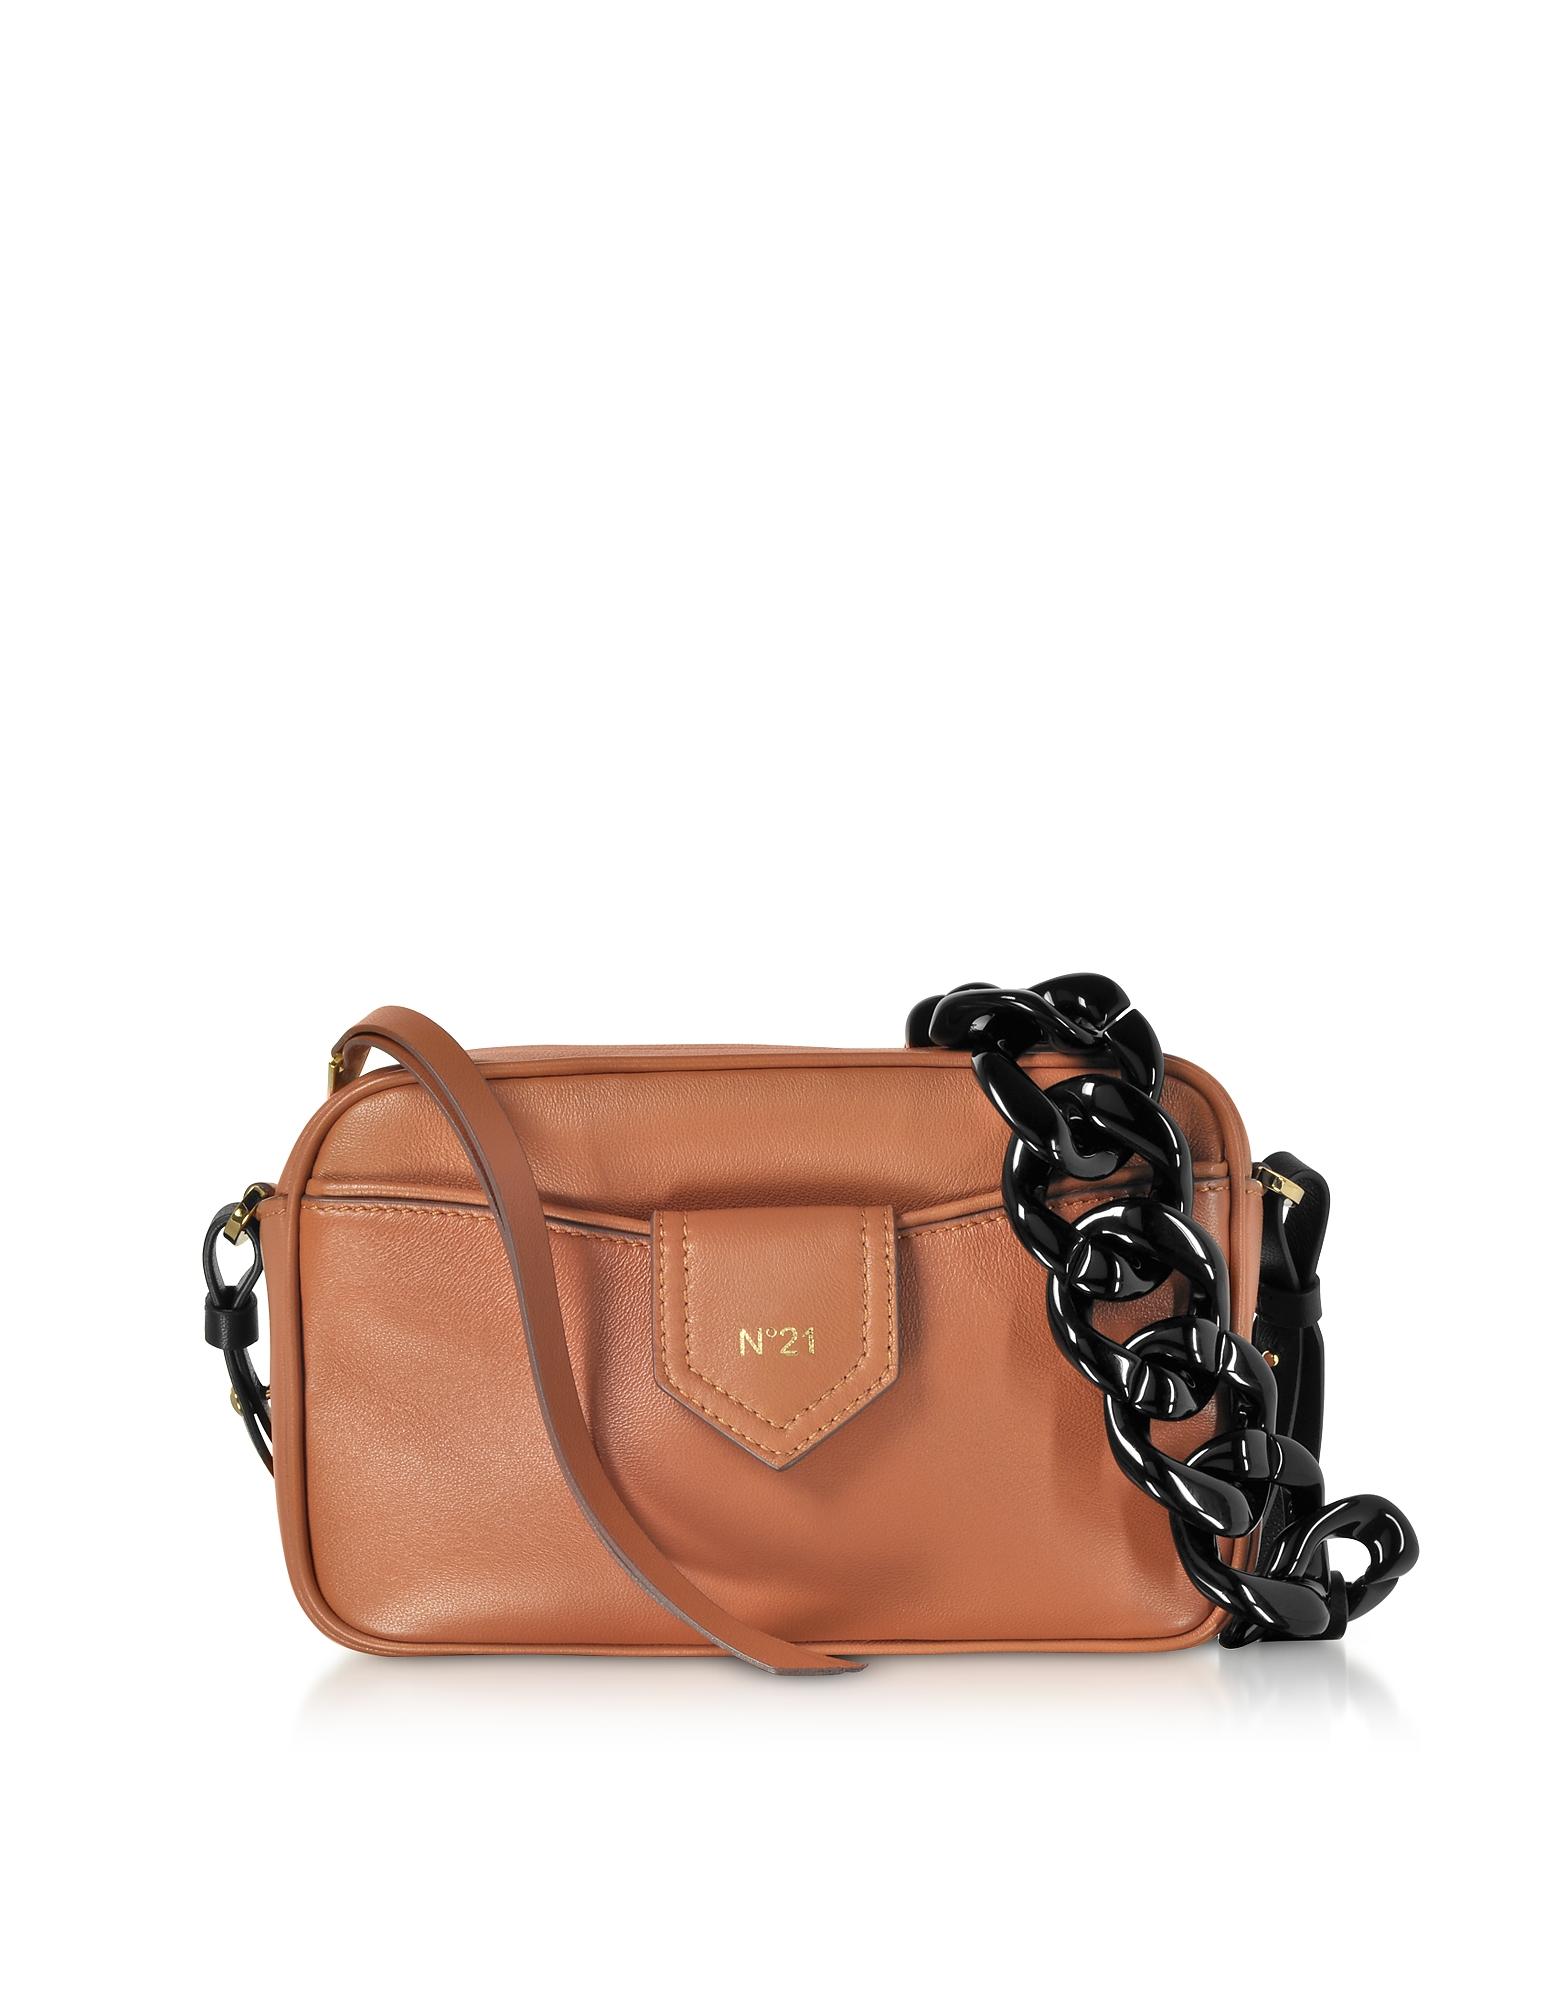 Caramel Nappa Leather Camera Bag